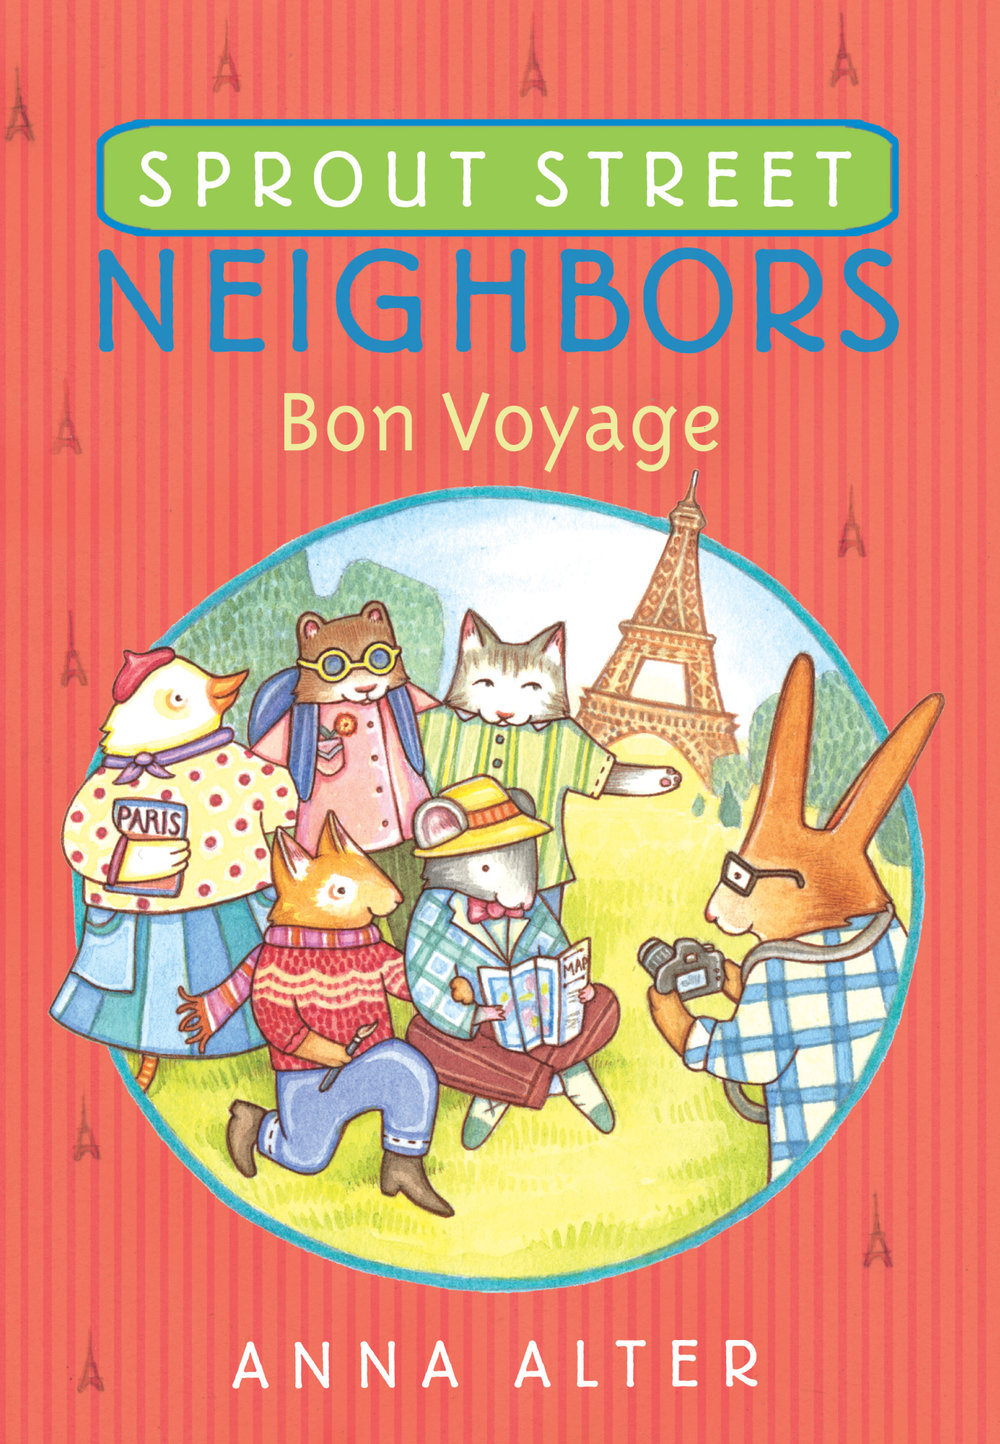 Bon Voyage jacket.jpg